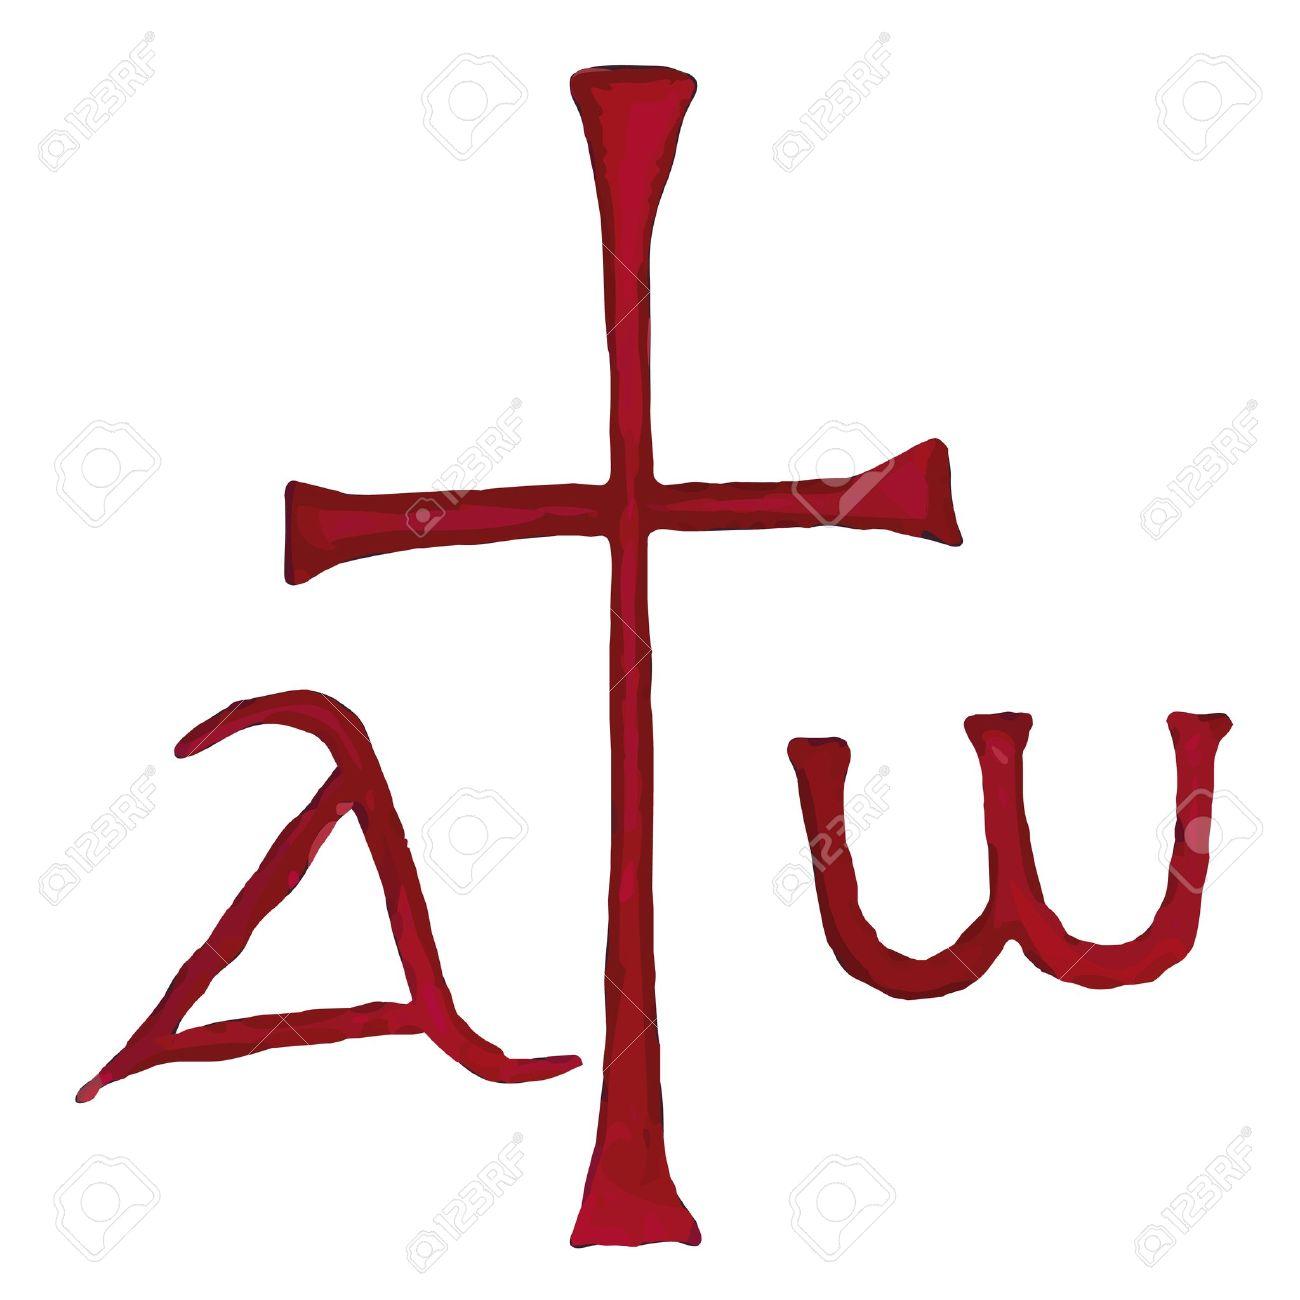 Greek alpha symbol tattoo biocorpaavc Image collections